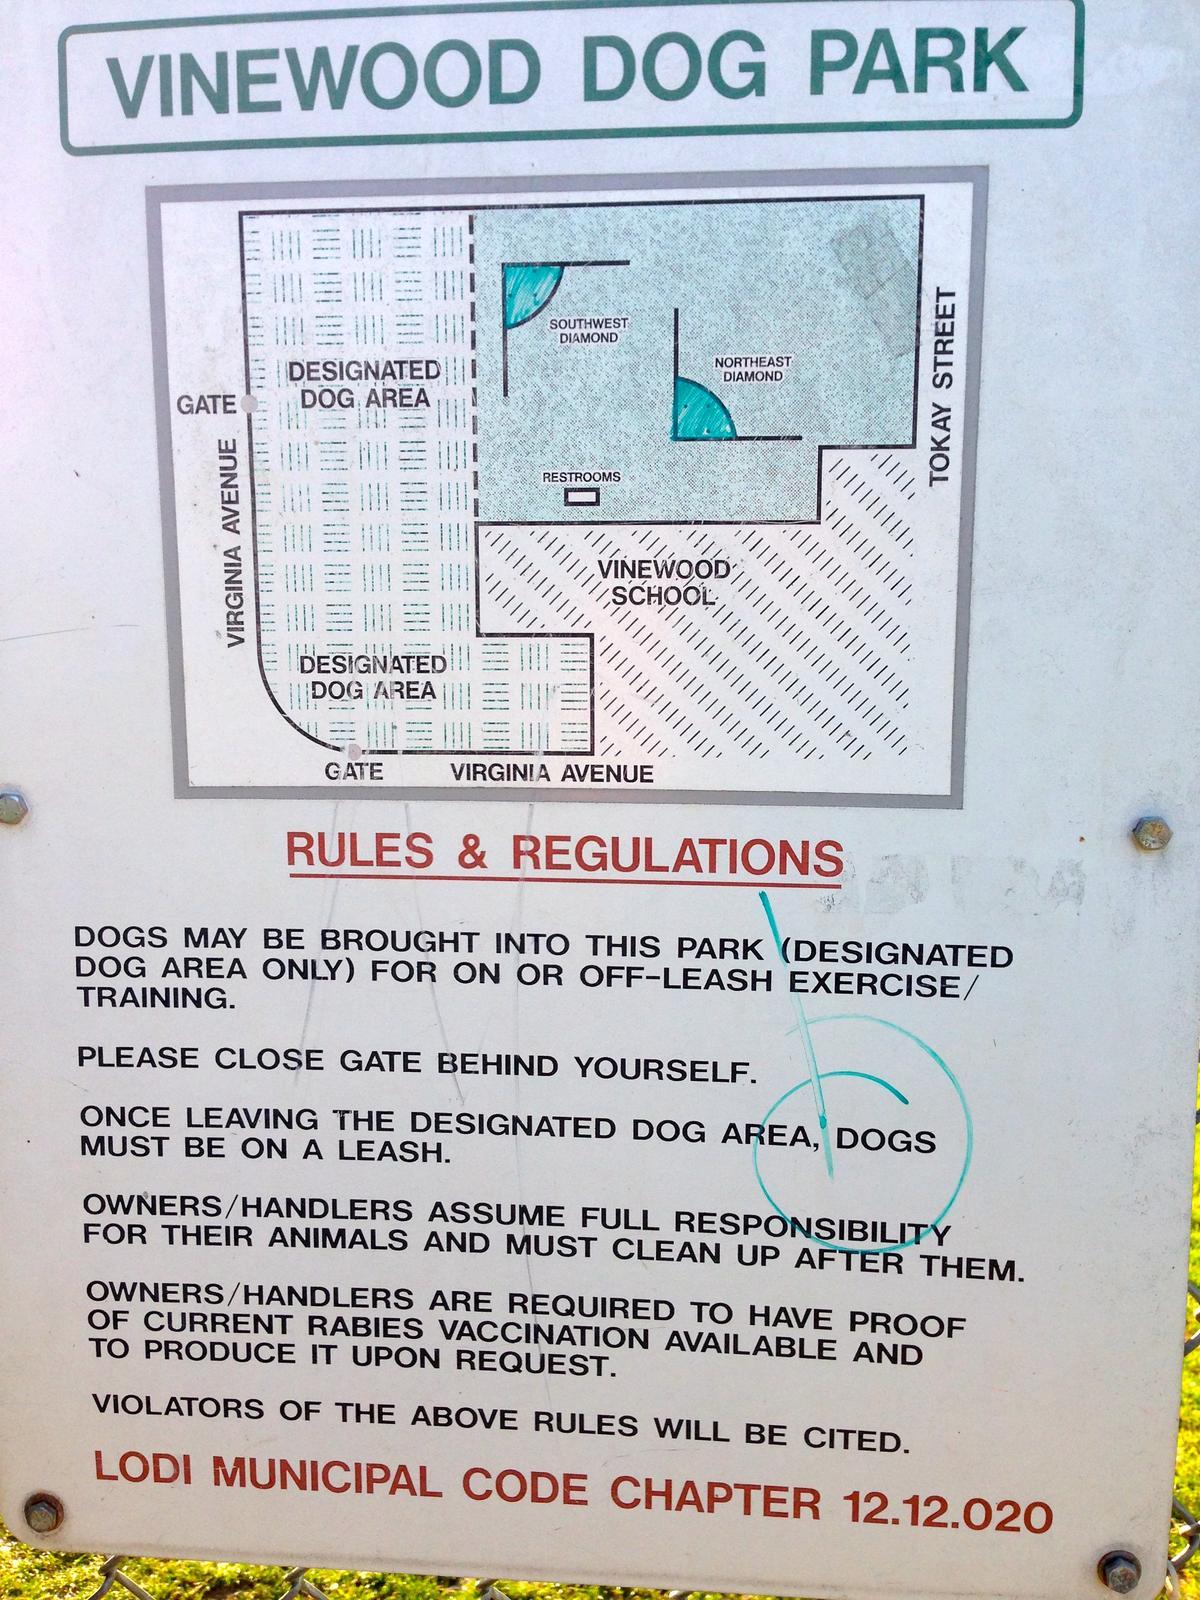 Vinewood Dog Park Rules